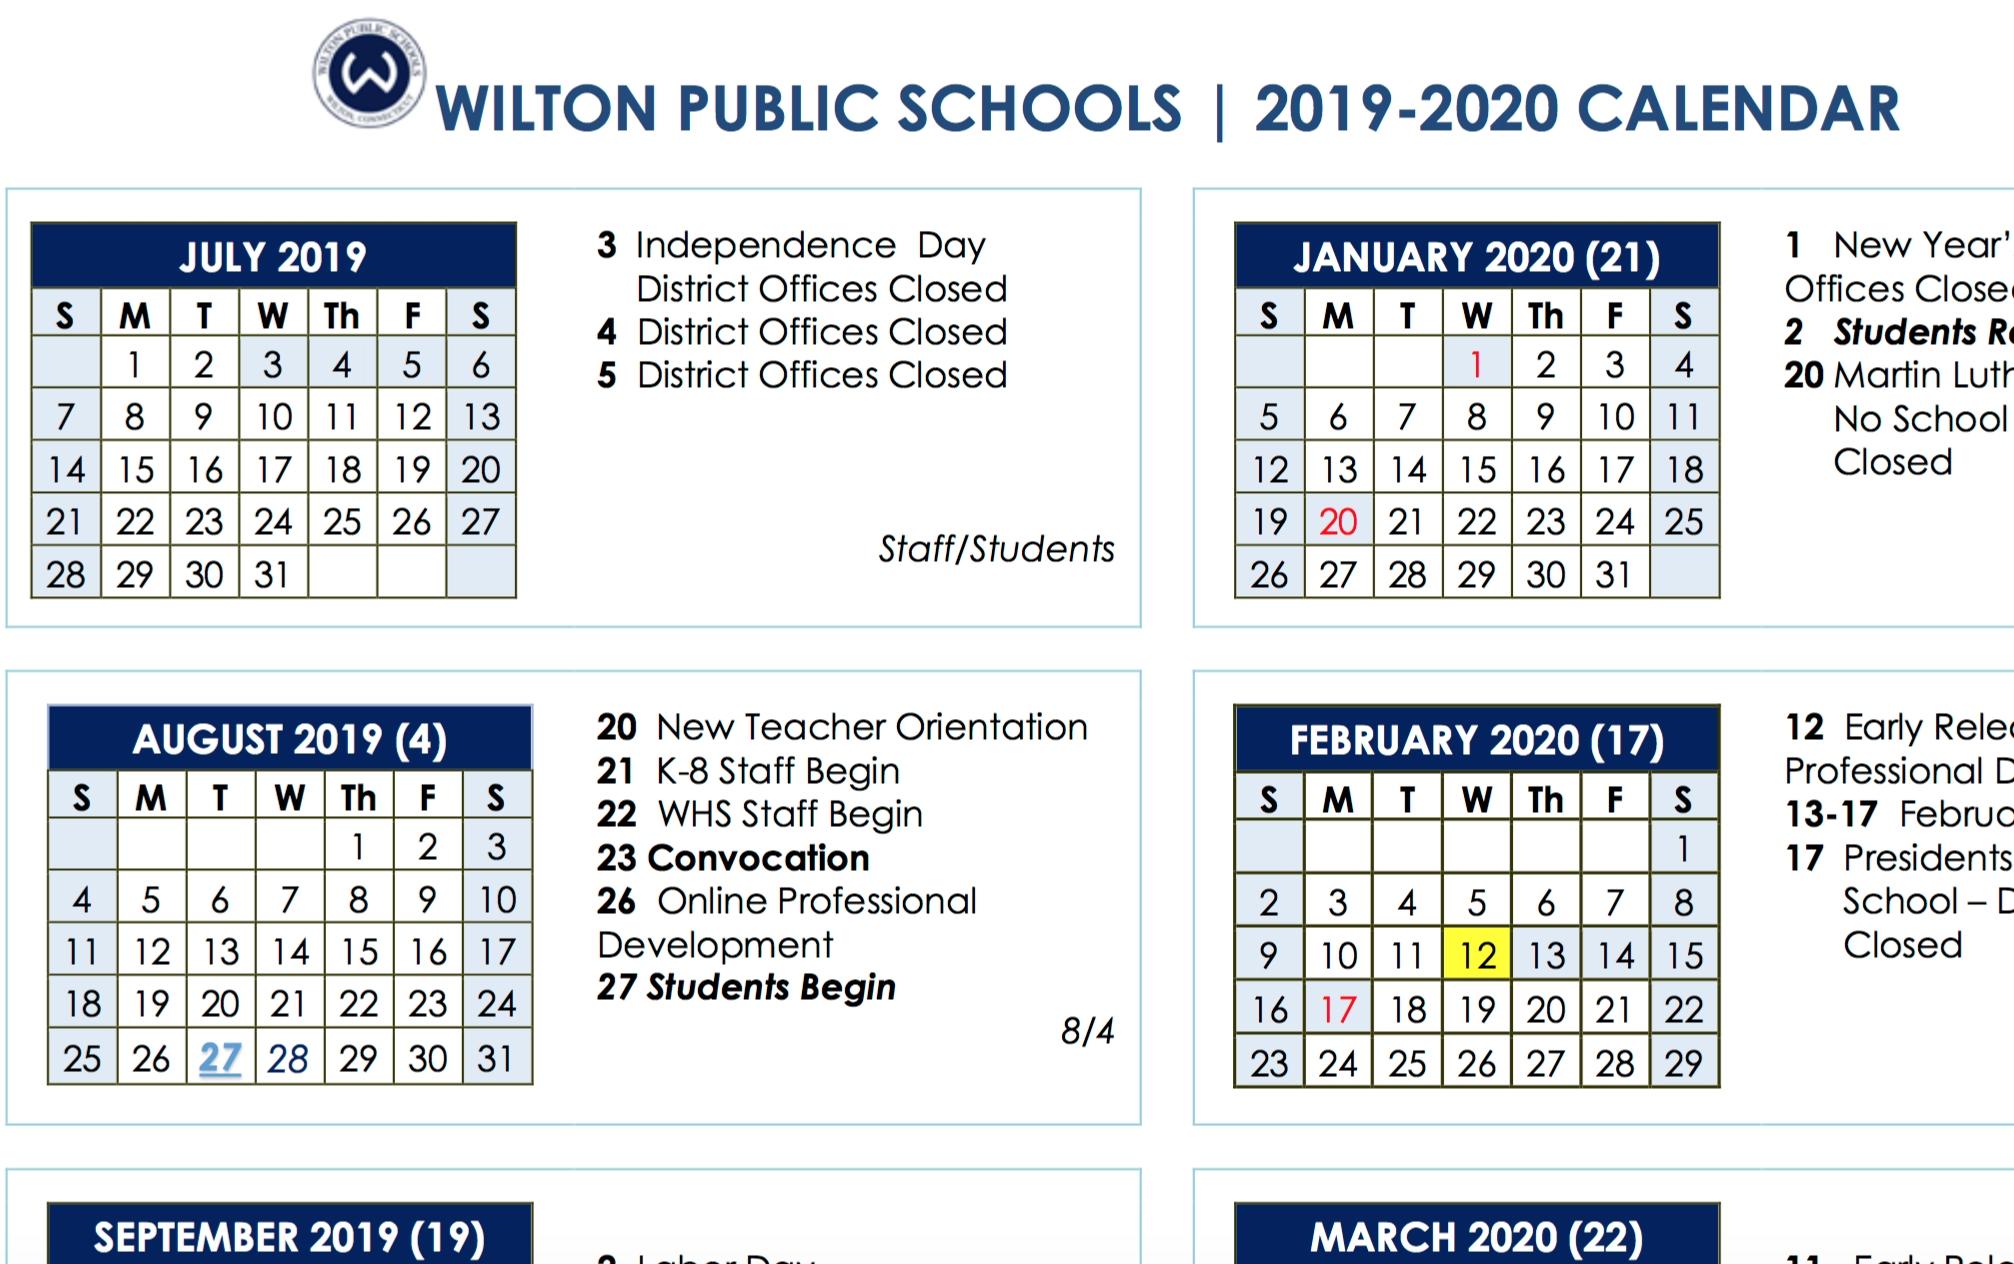 Board Of Education Approves 2019-2020 And 2020-2021 School Year_School Calendar Bridgeport Ct